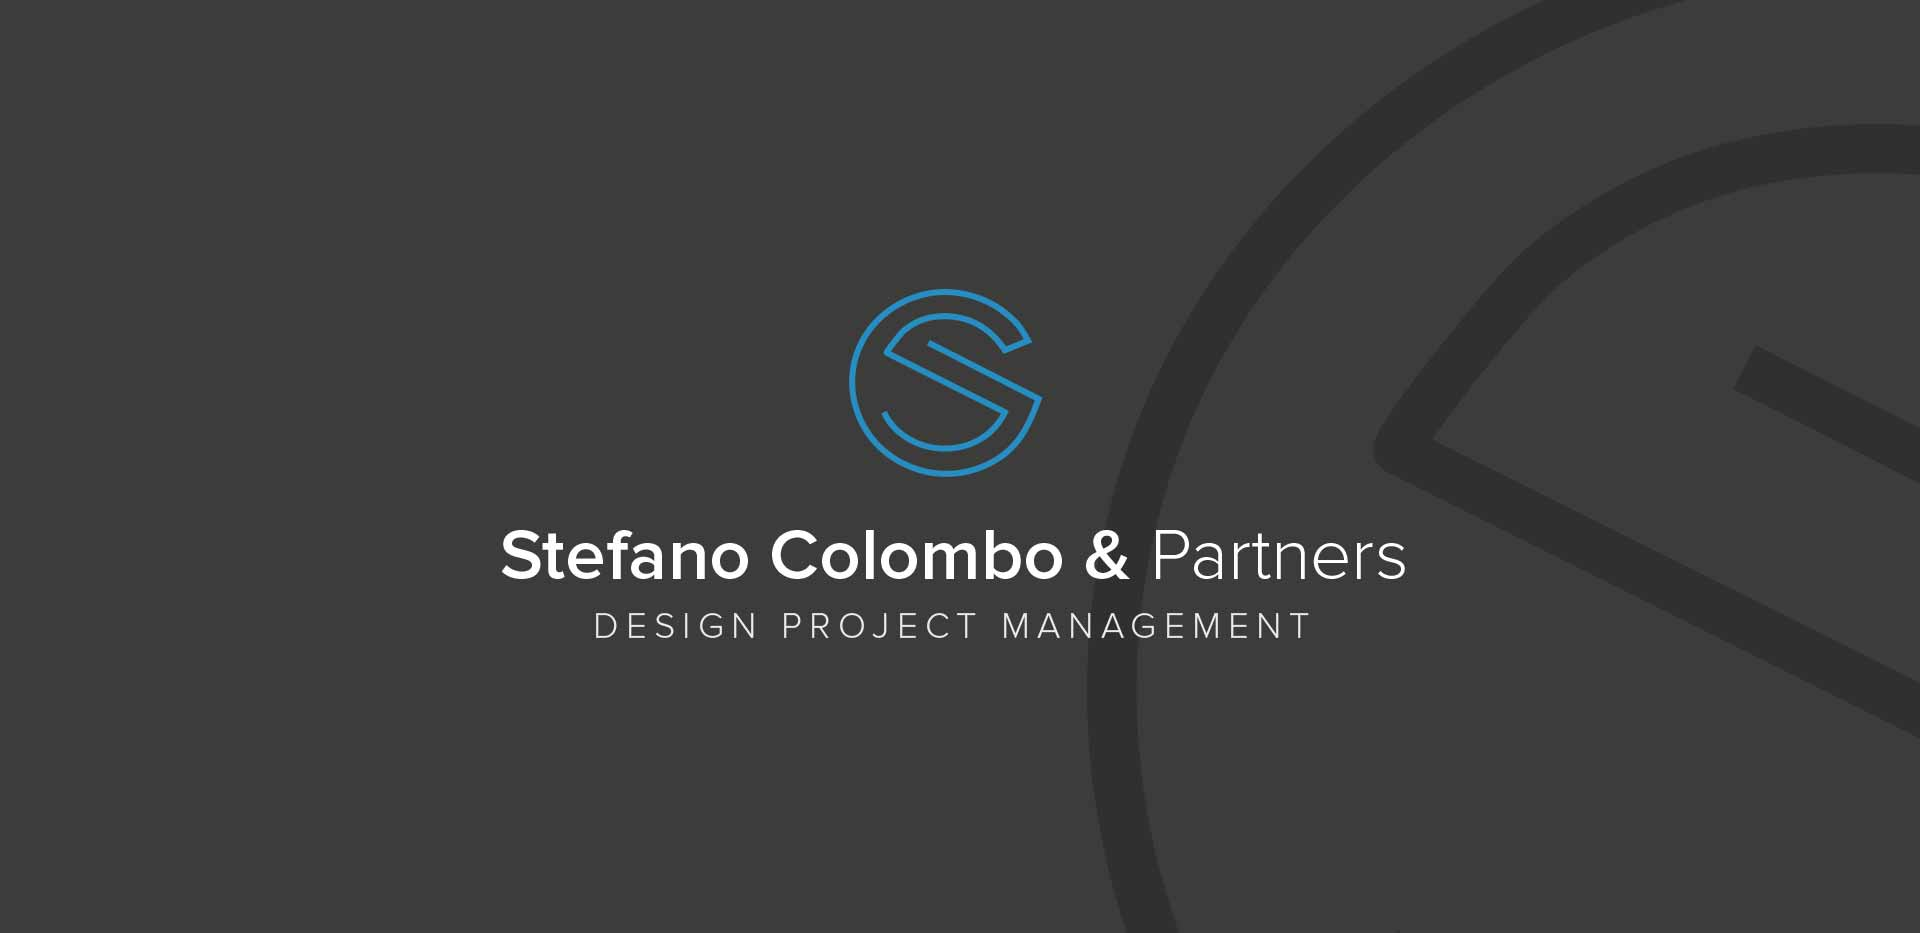 Negative version company corporate identity logo